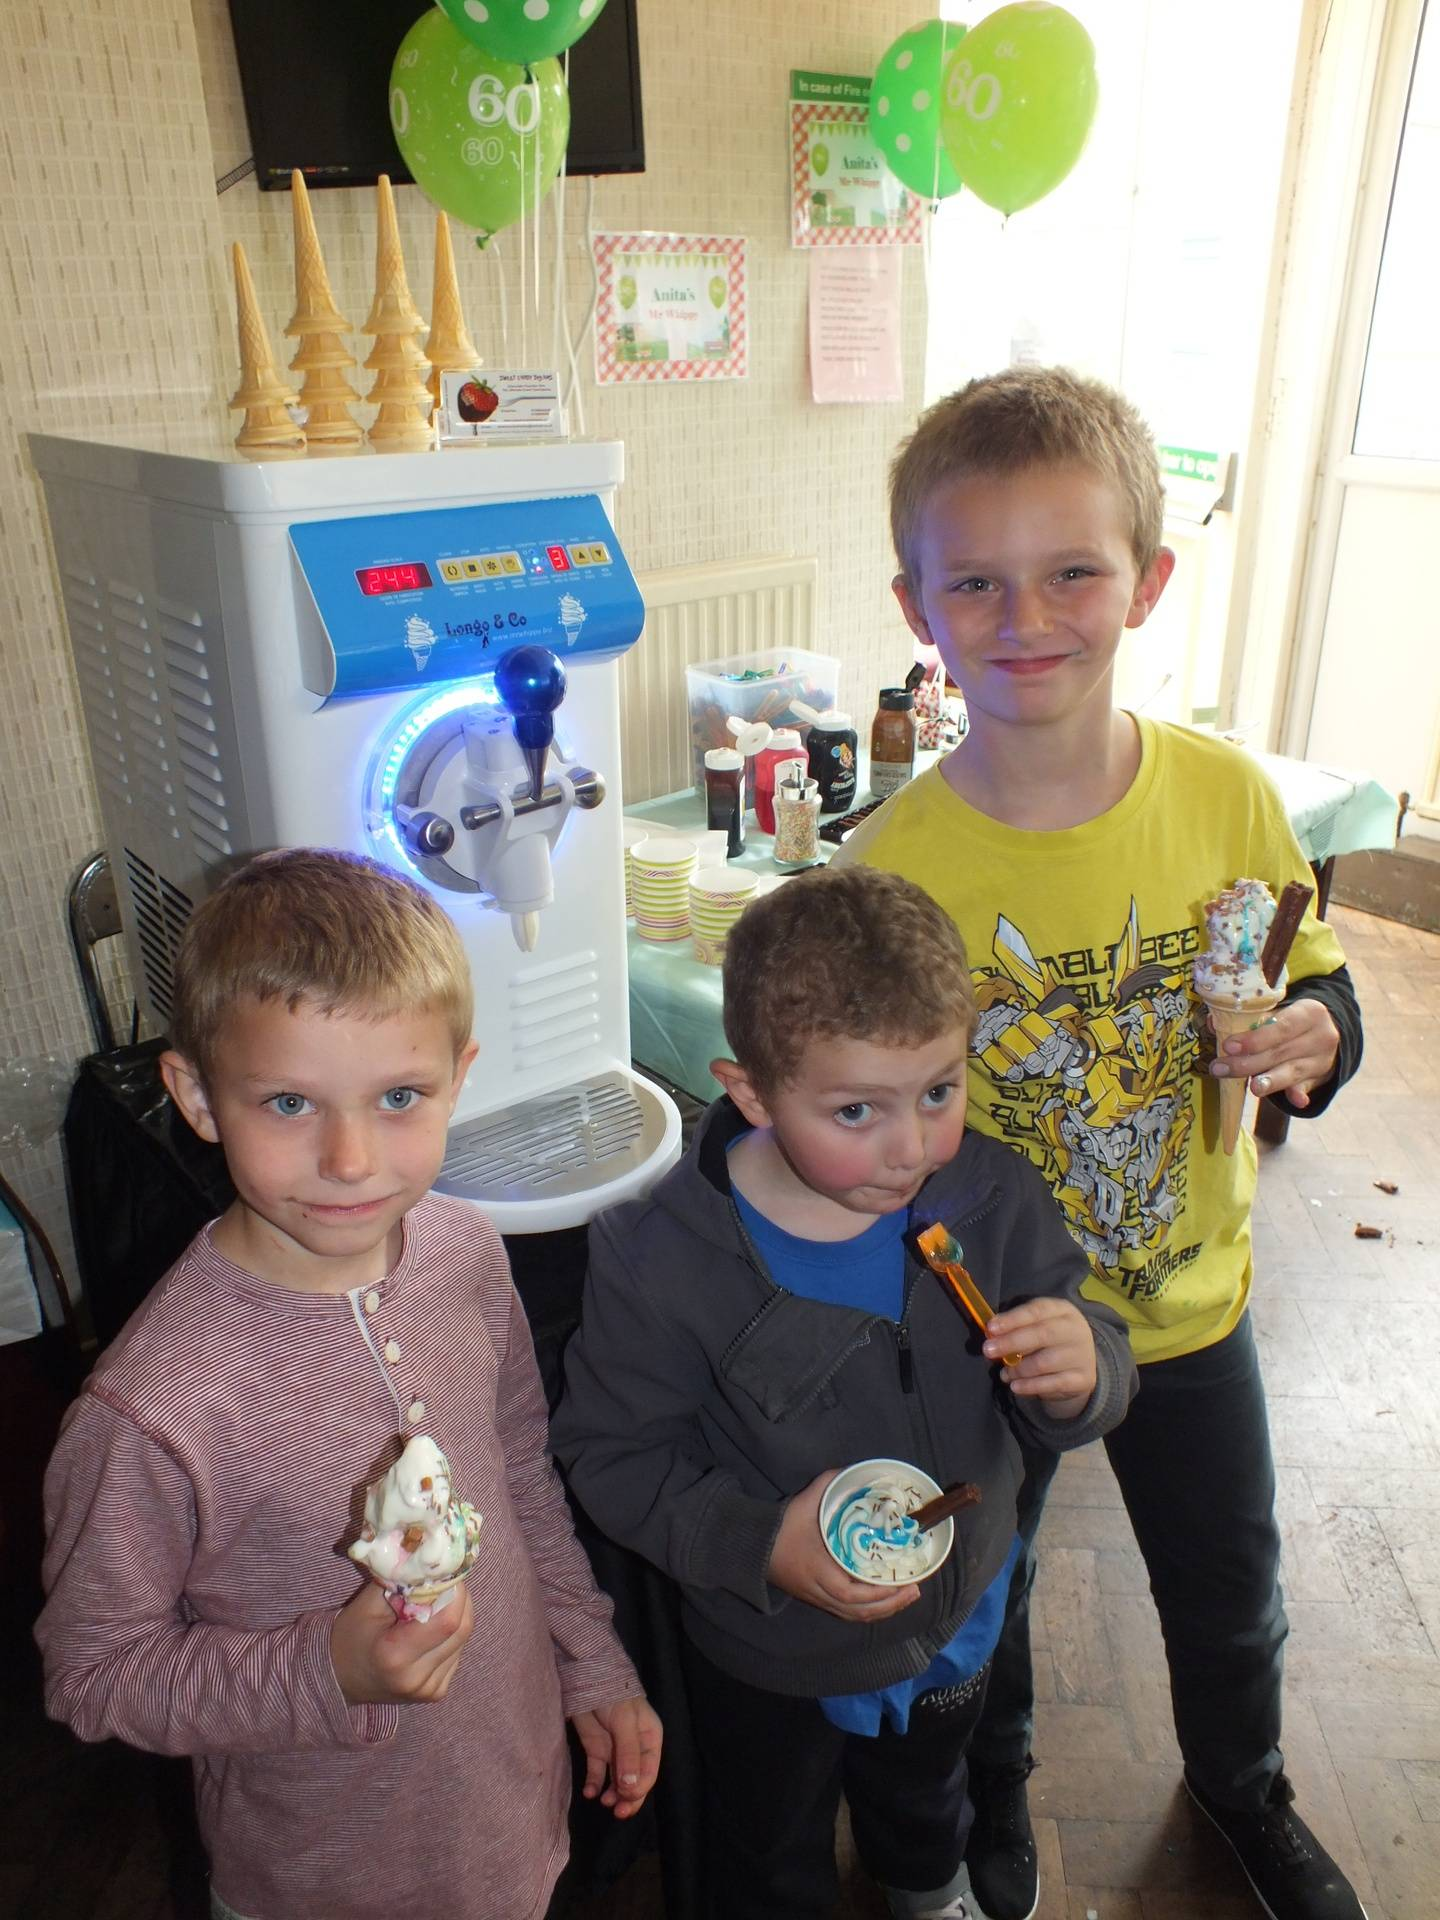 Mr Whippy ice cream machine hire in Sheffield